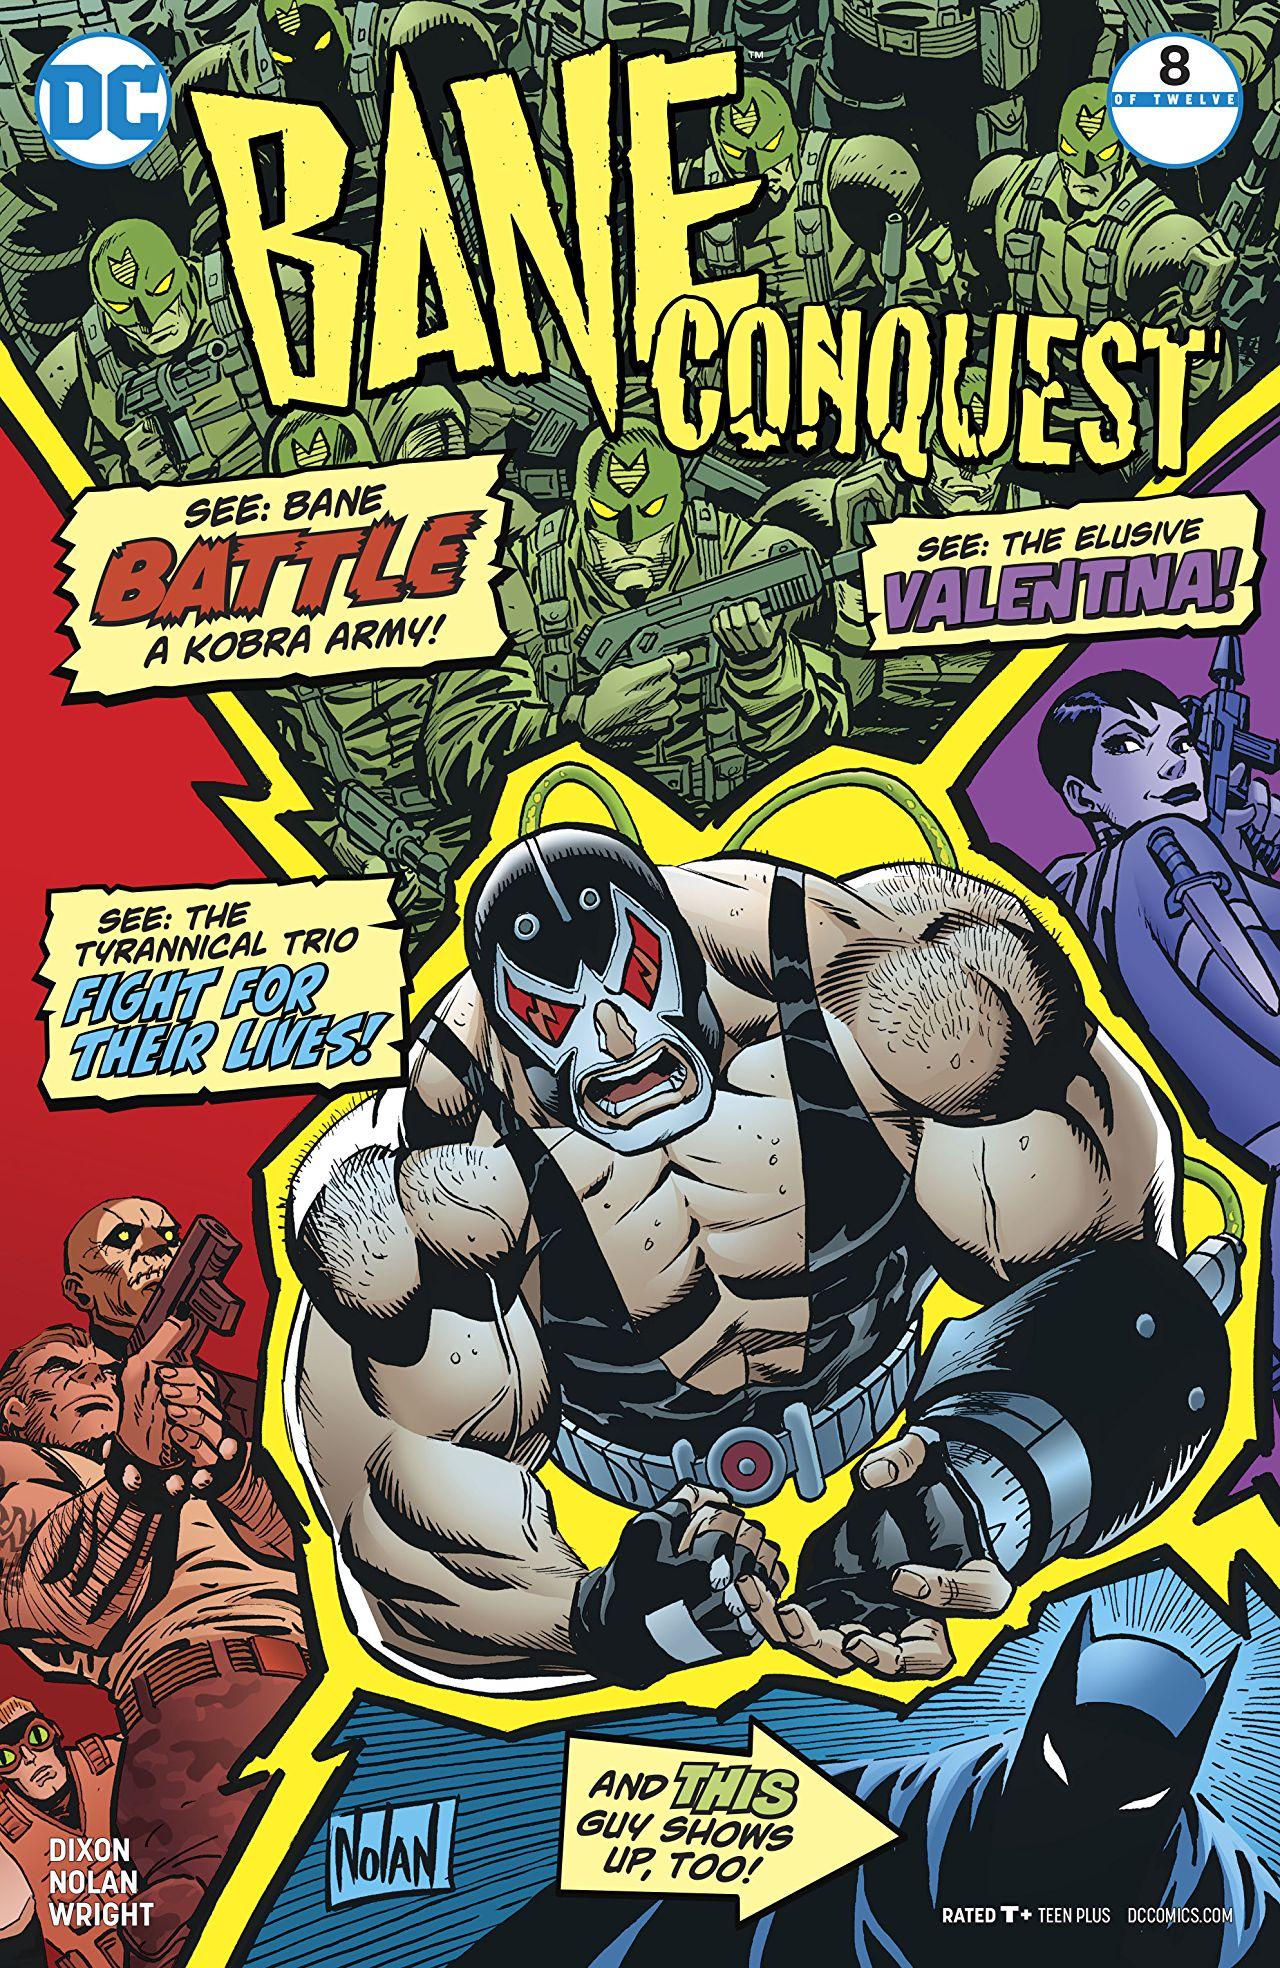 Bane Conquest #8